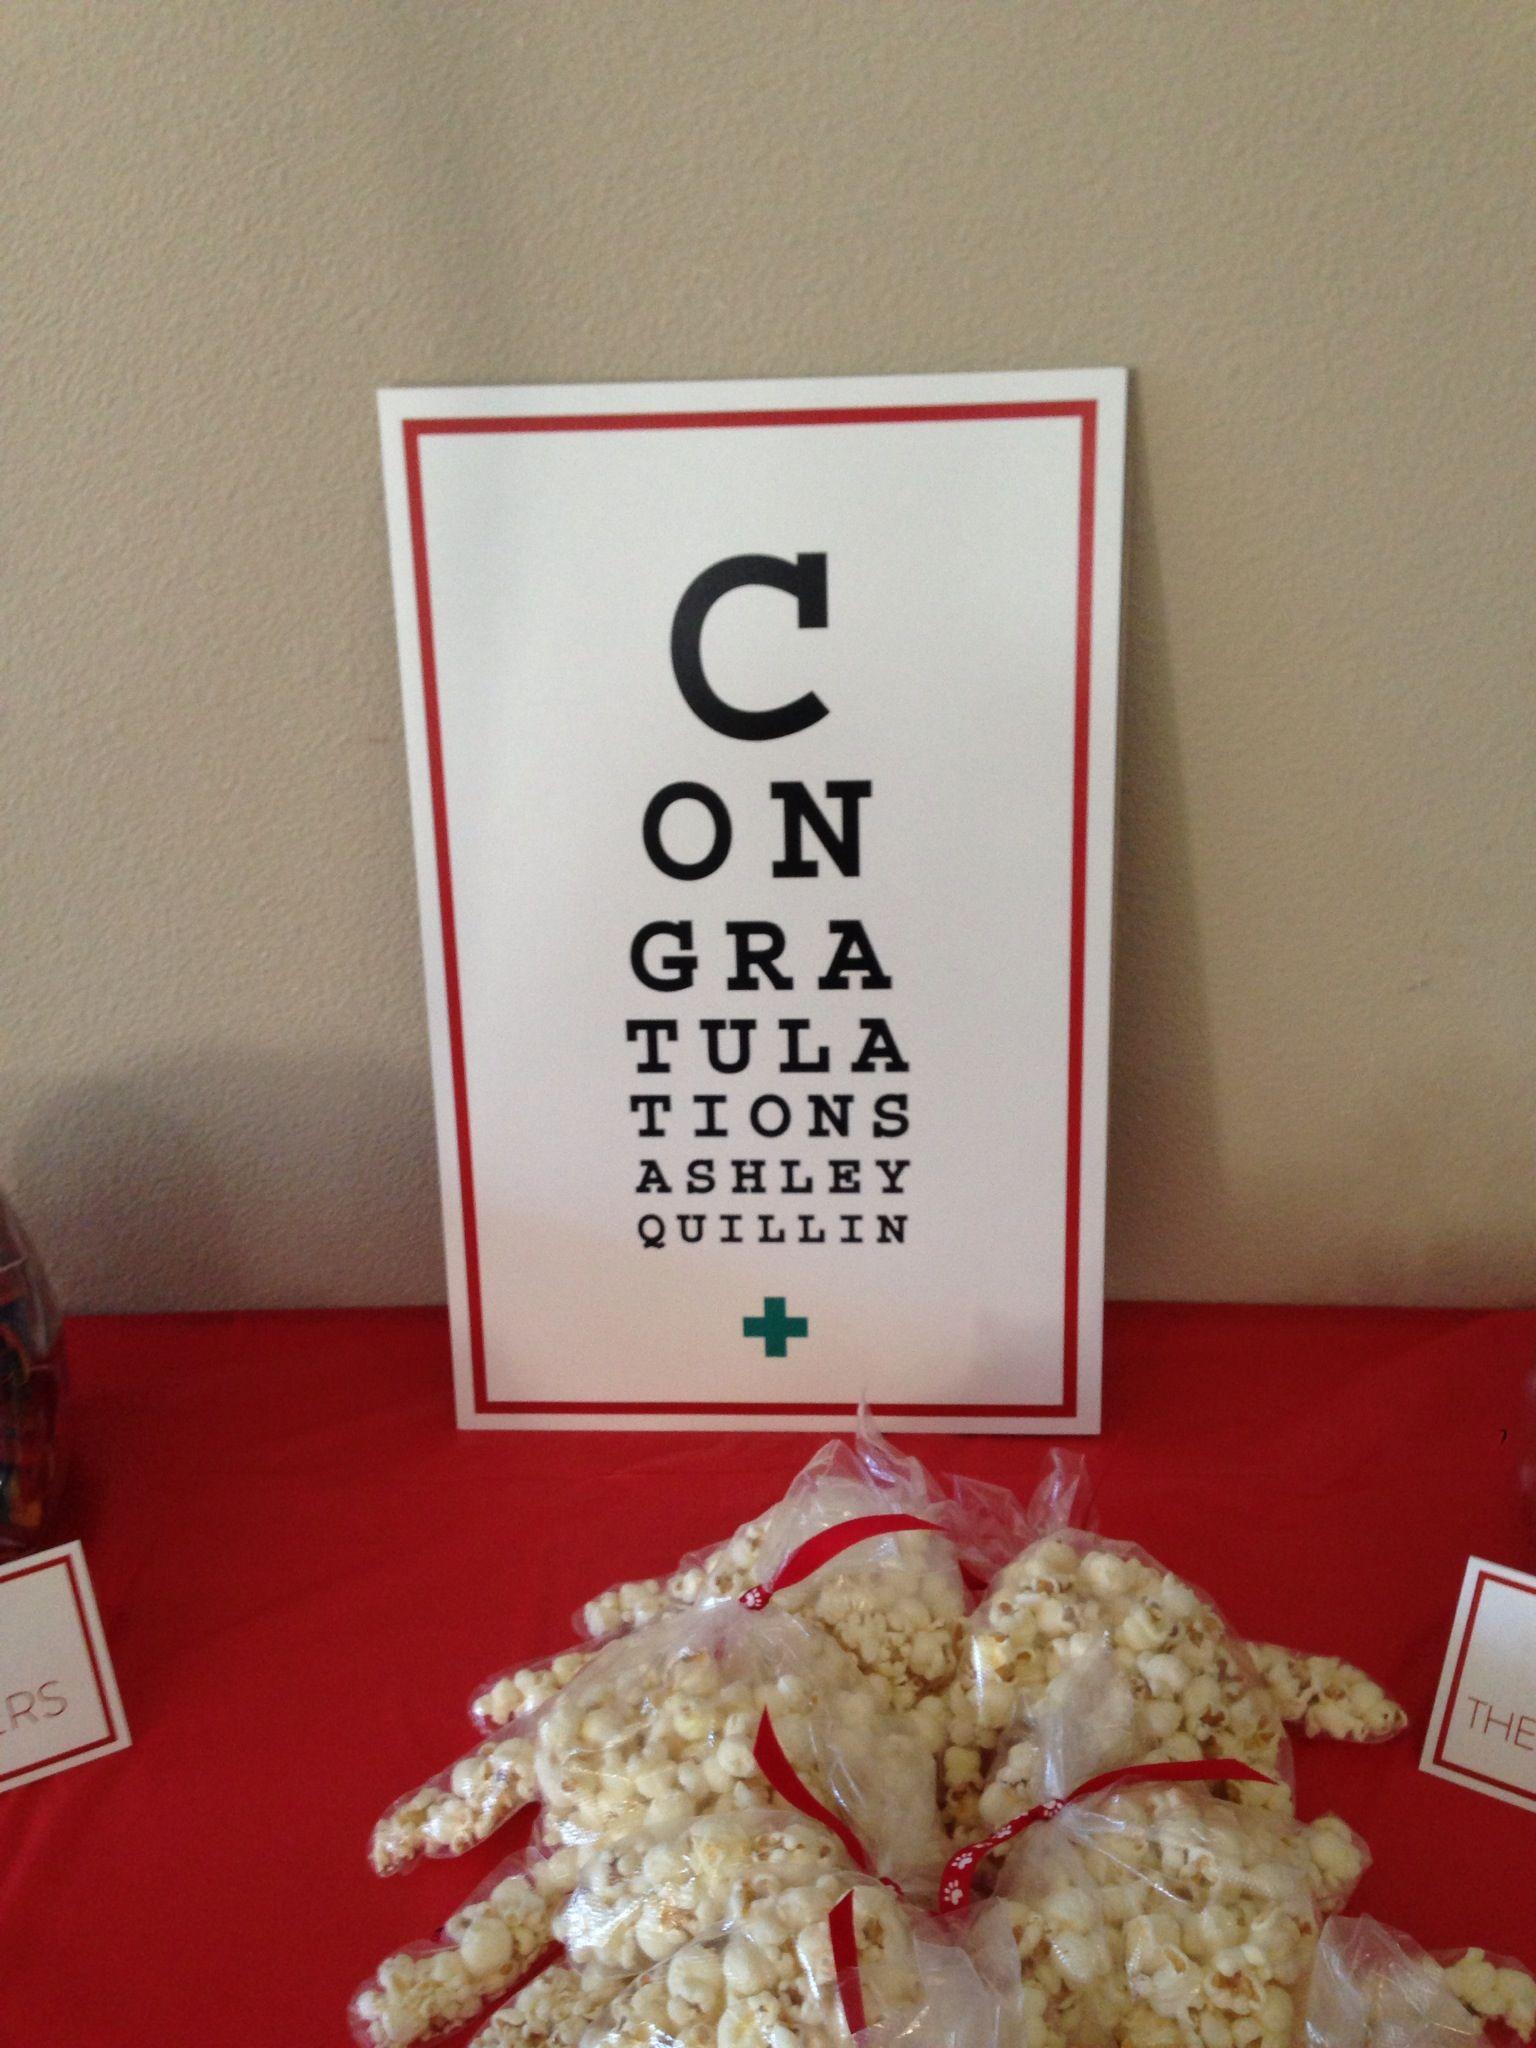 Eye chart at my nursing graduation party nursing graduation eye chart at my nursing graduation party nvjuhfo Gallery